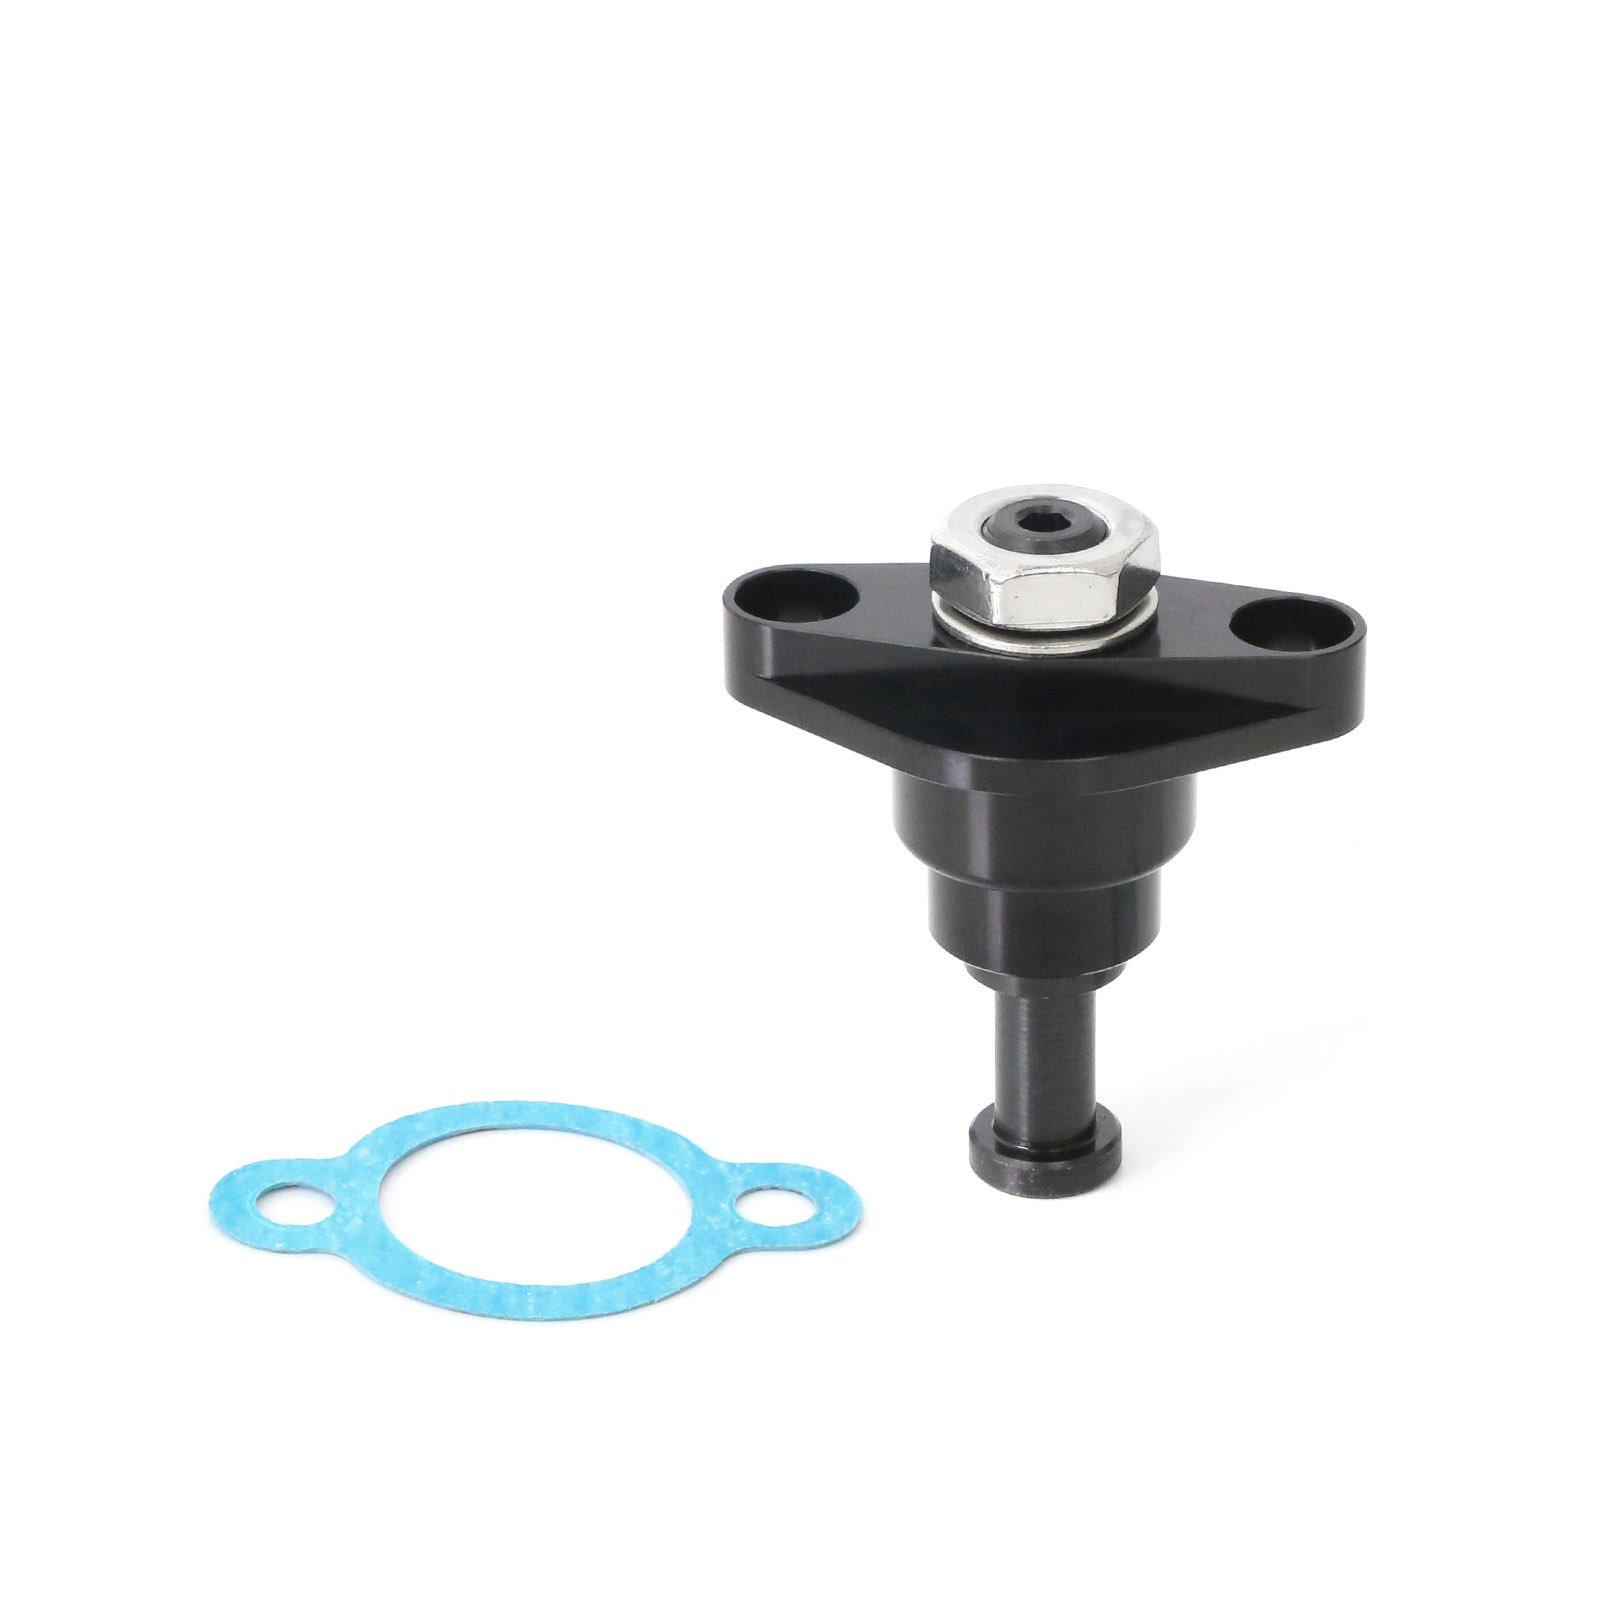 Black CNC Manual Cam Chain Tensioner For Honda CRF450X 05-15 06 07 08 09 10 11